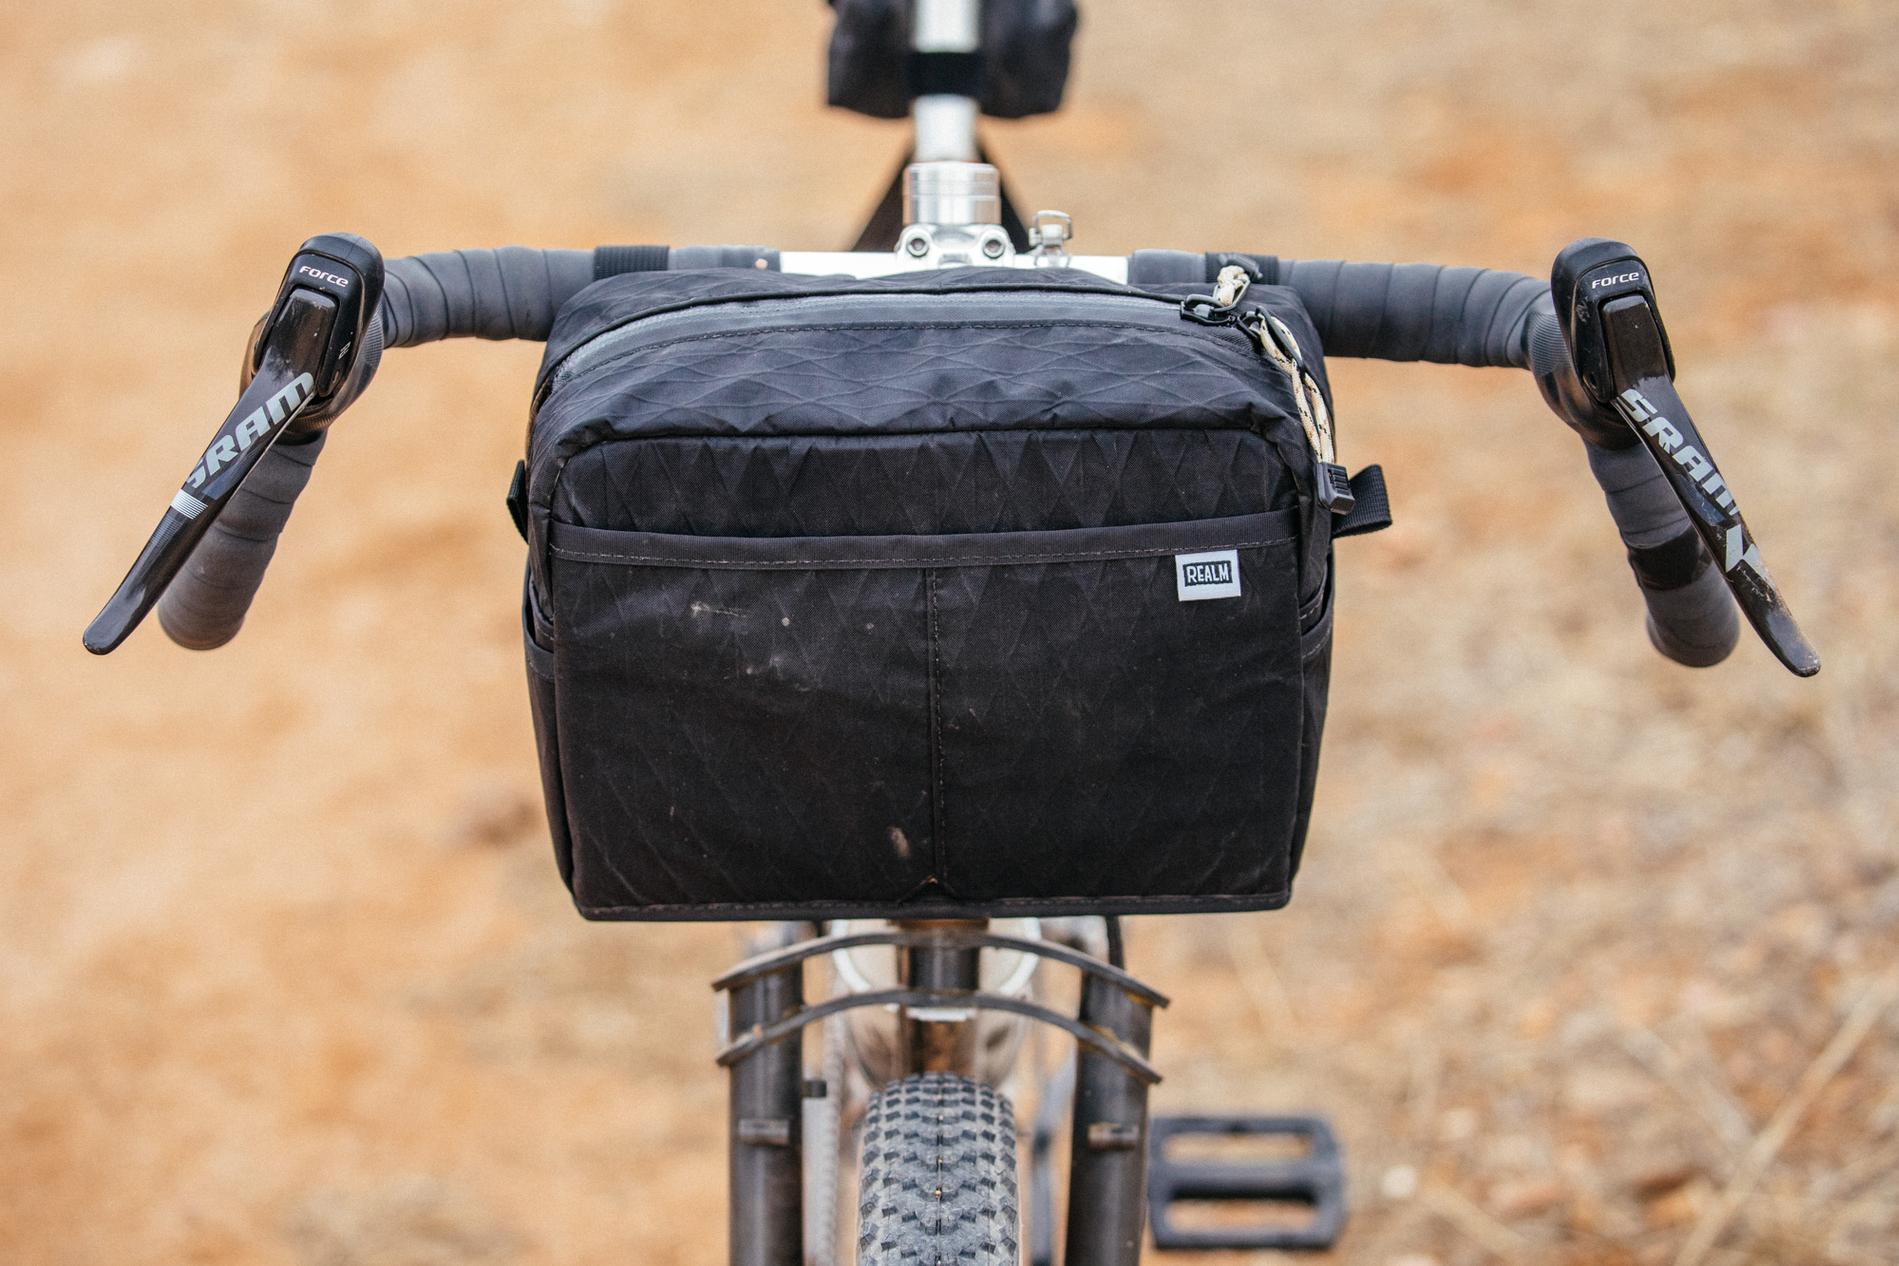 Super Stoke 2019: Hanson's Rusty Crusty Evasion with Dark Realm Bags